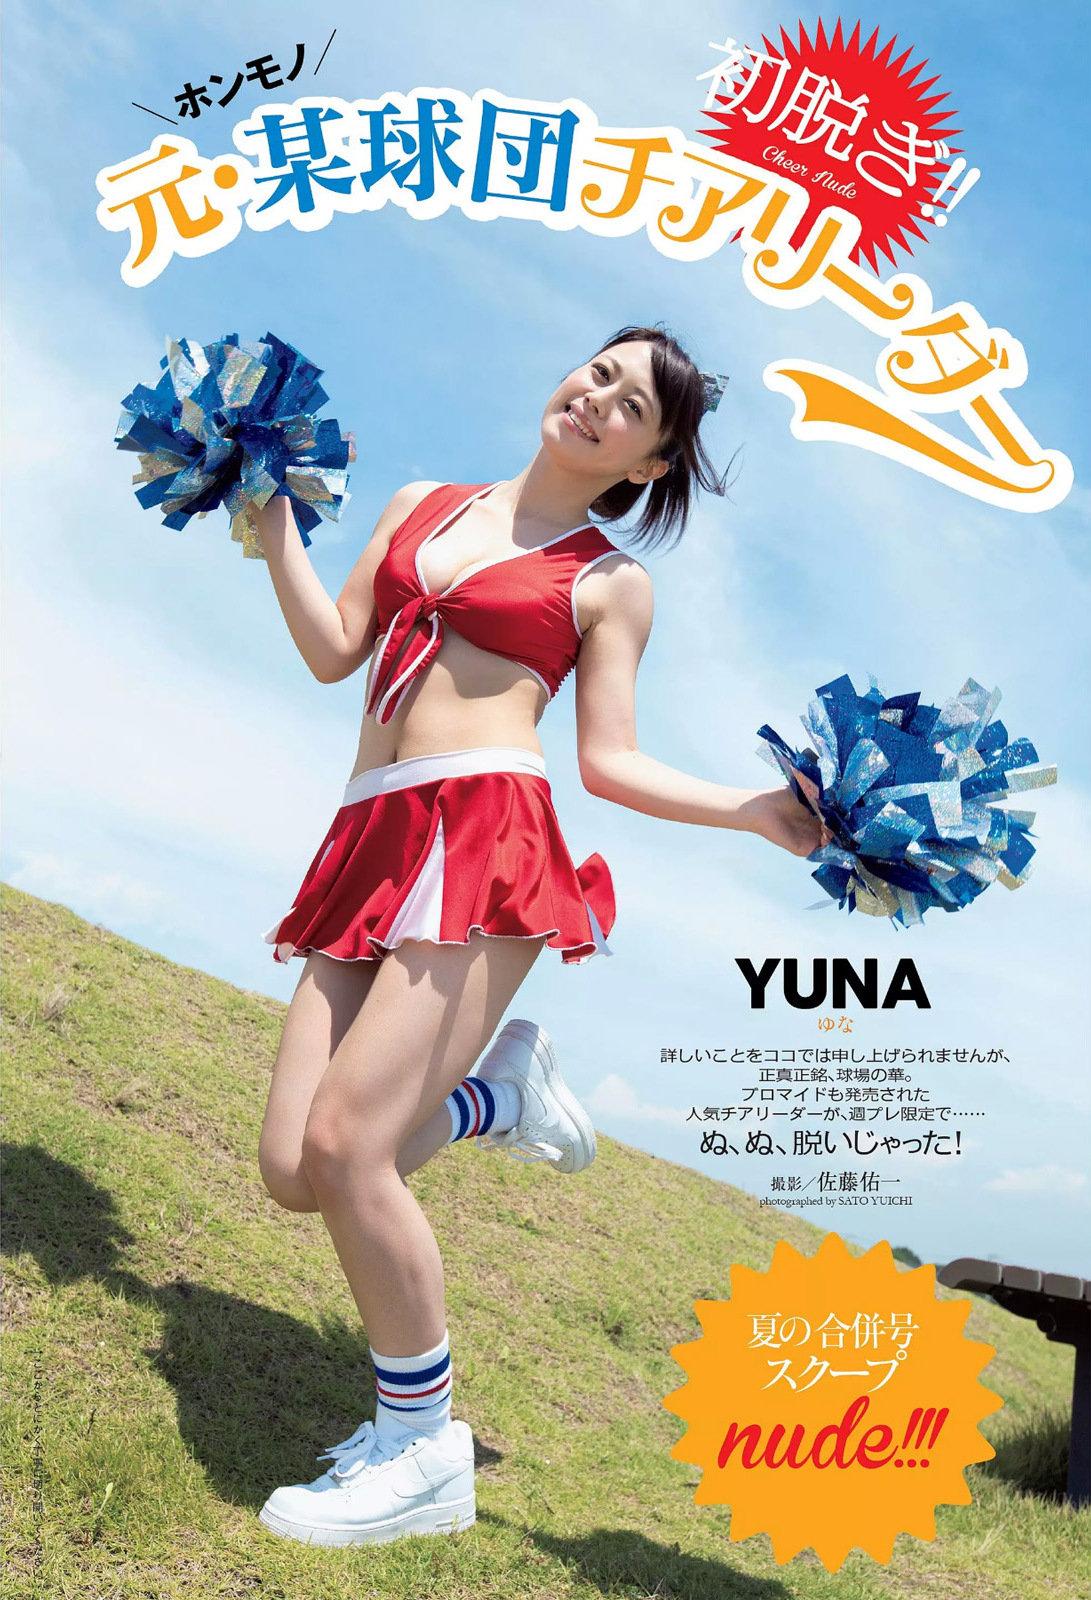 MUTEKIデビューYUNA001